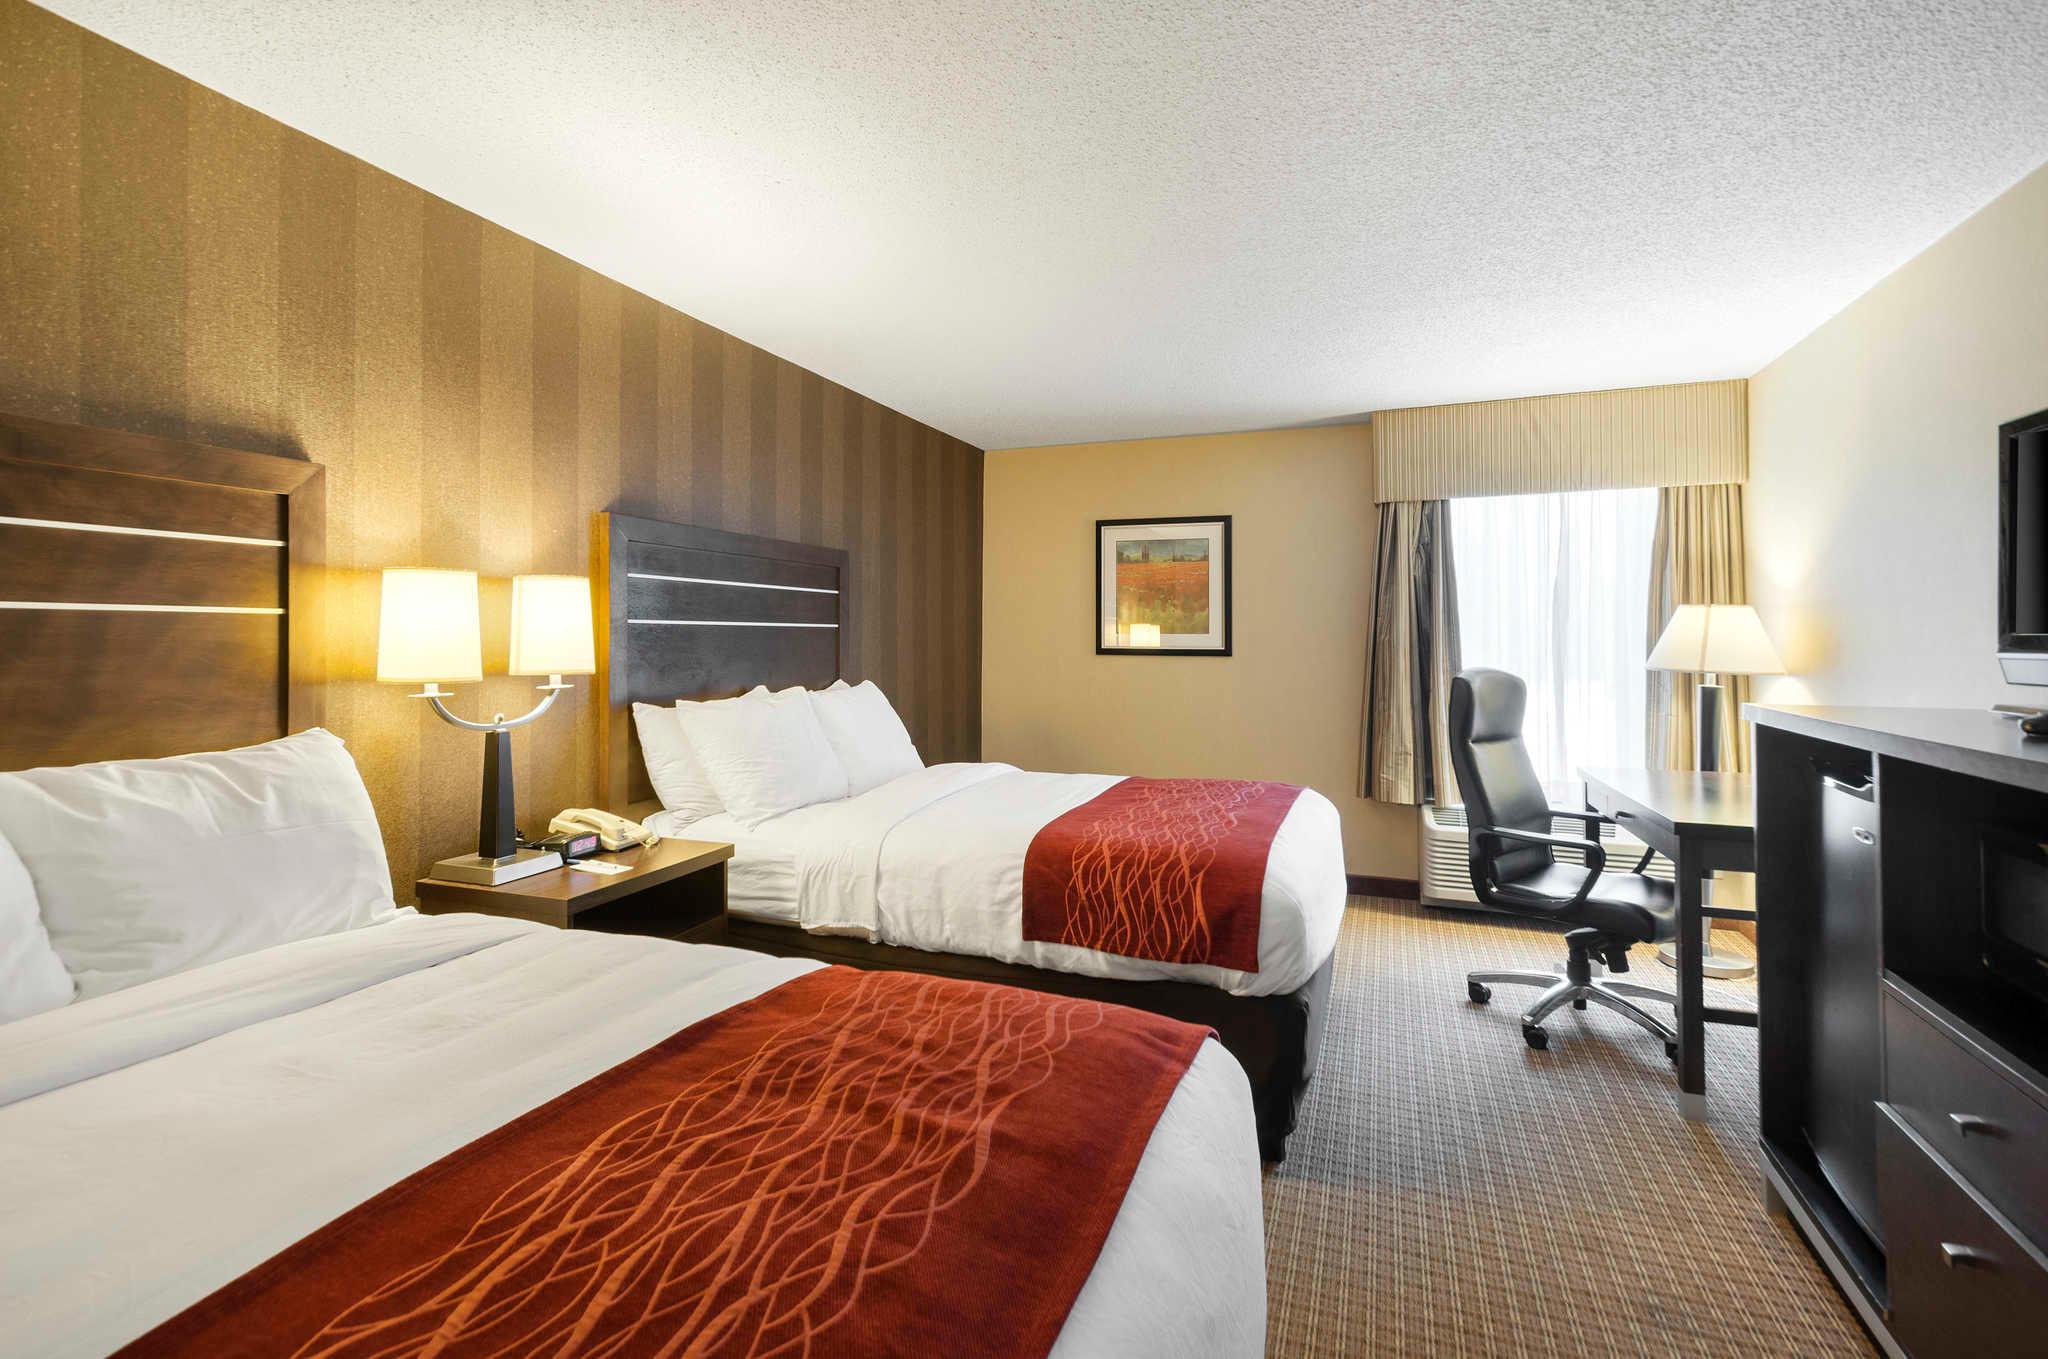 Comfort Inn & Suites Edgewood - Aberdeen image 6